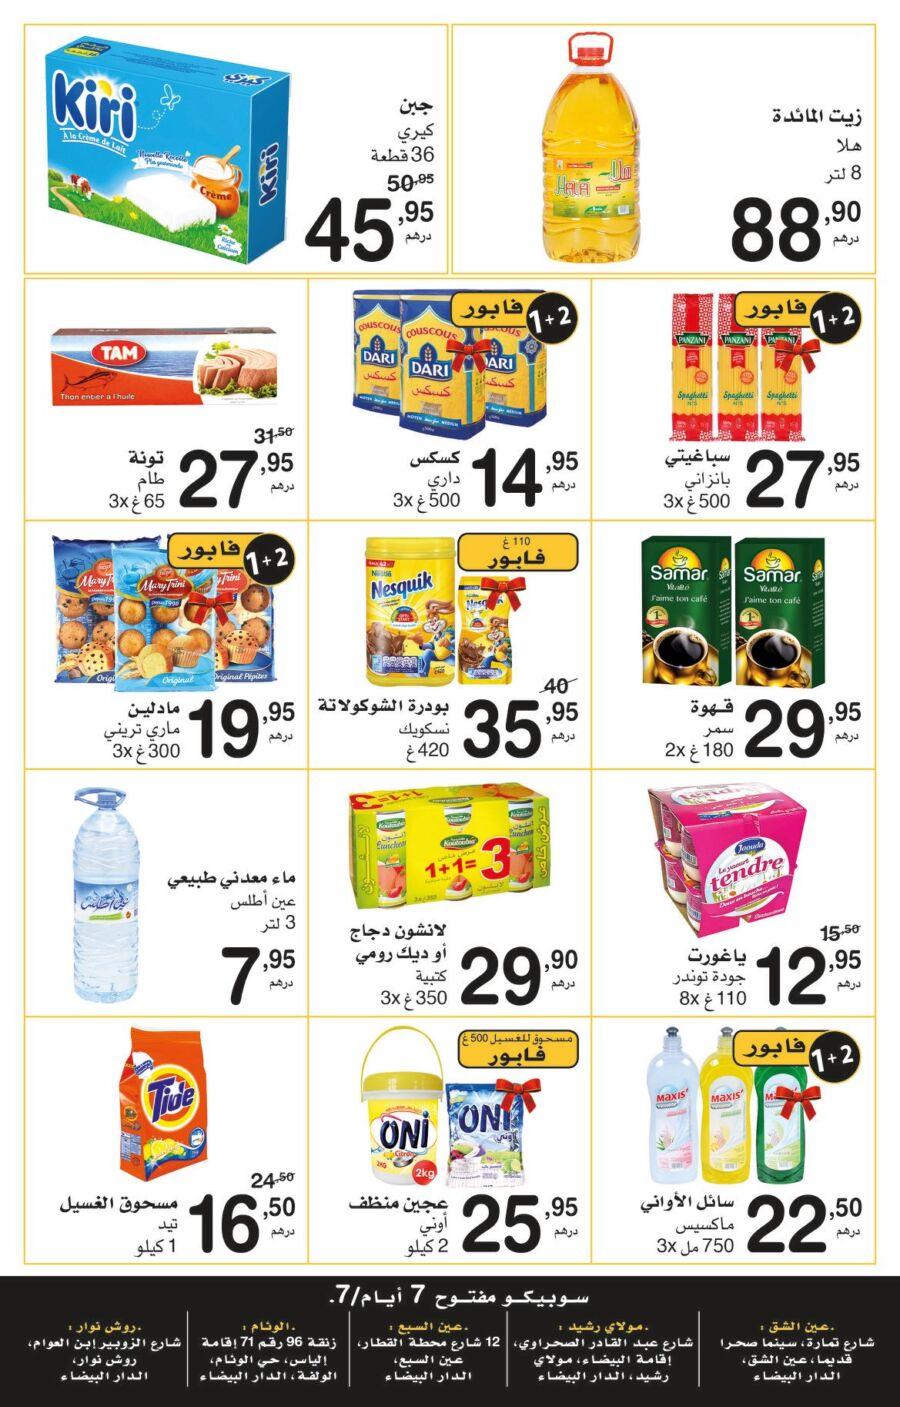 Catalogue Supeco Maroc أثمنة ديما رخيصة du 1 au 14 Octobre 2020